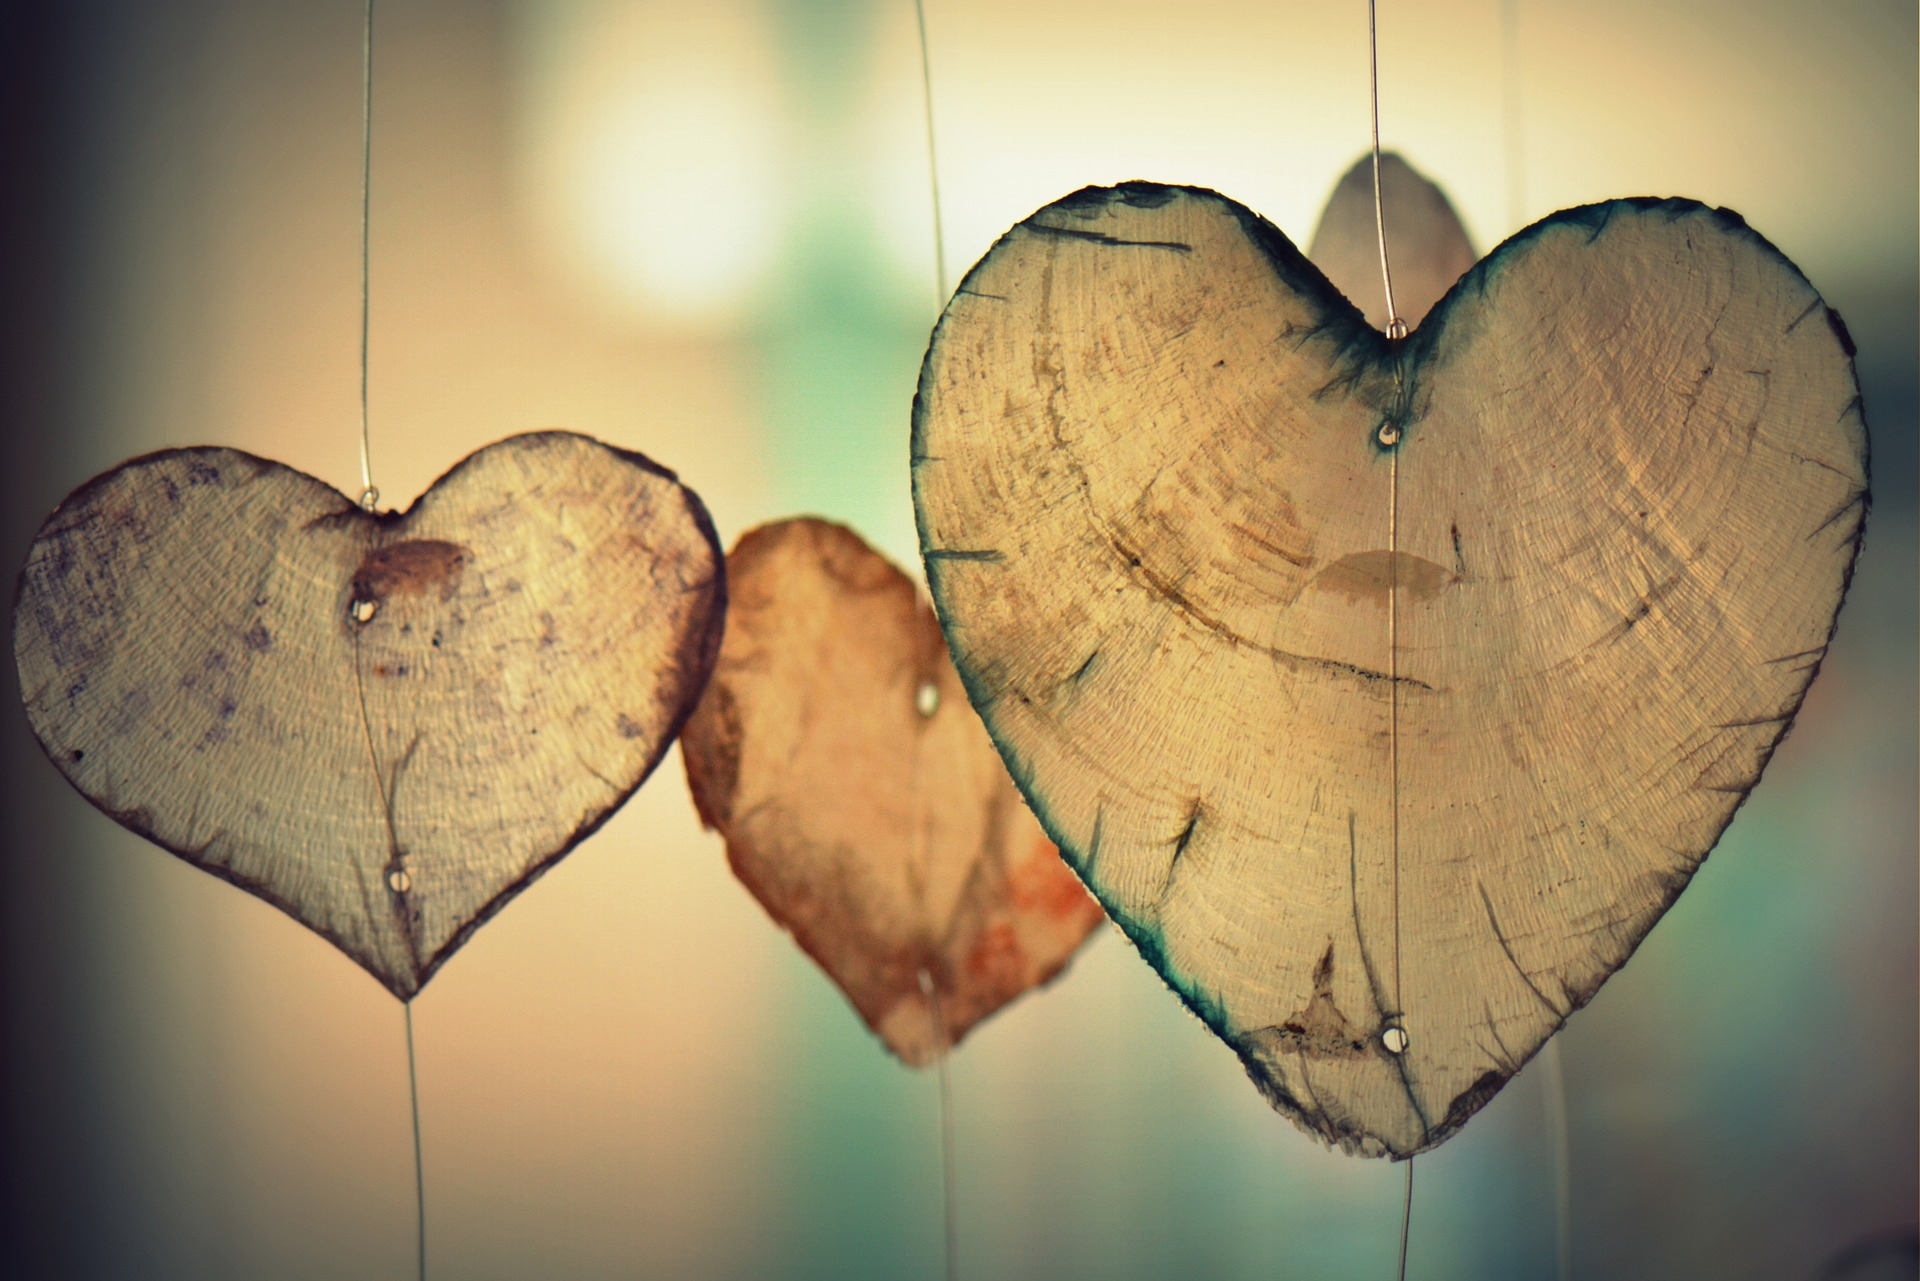 horoscop dragoste - sfatulparintilor.ro - pixabay_com - heart-700141_1920